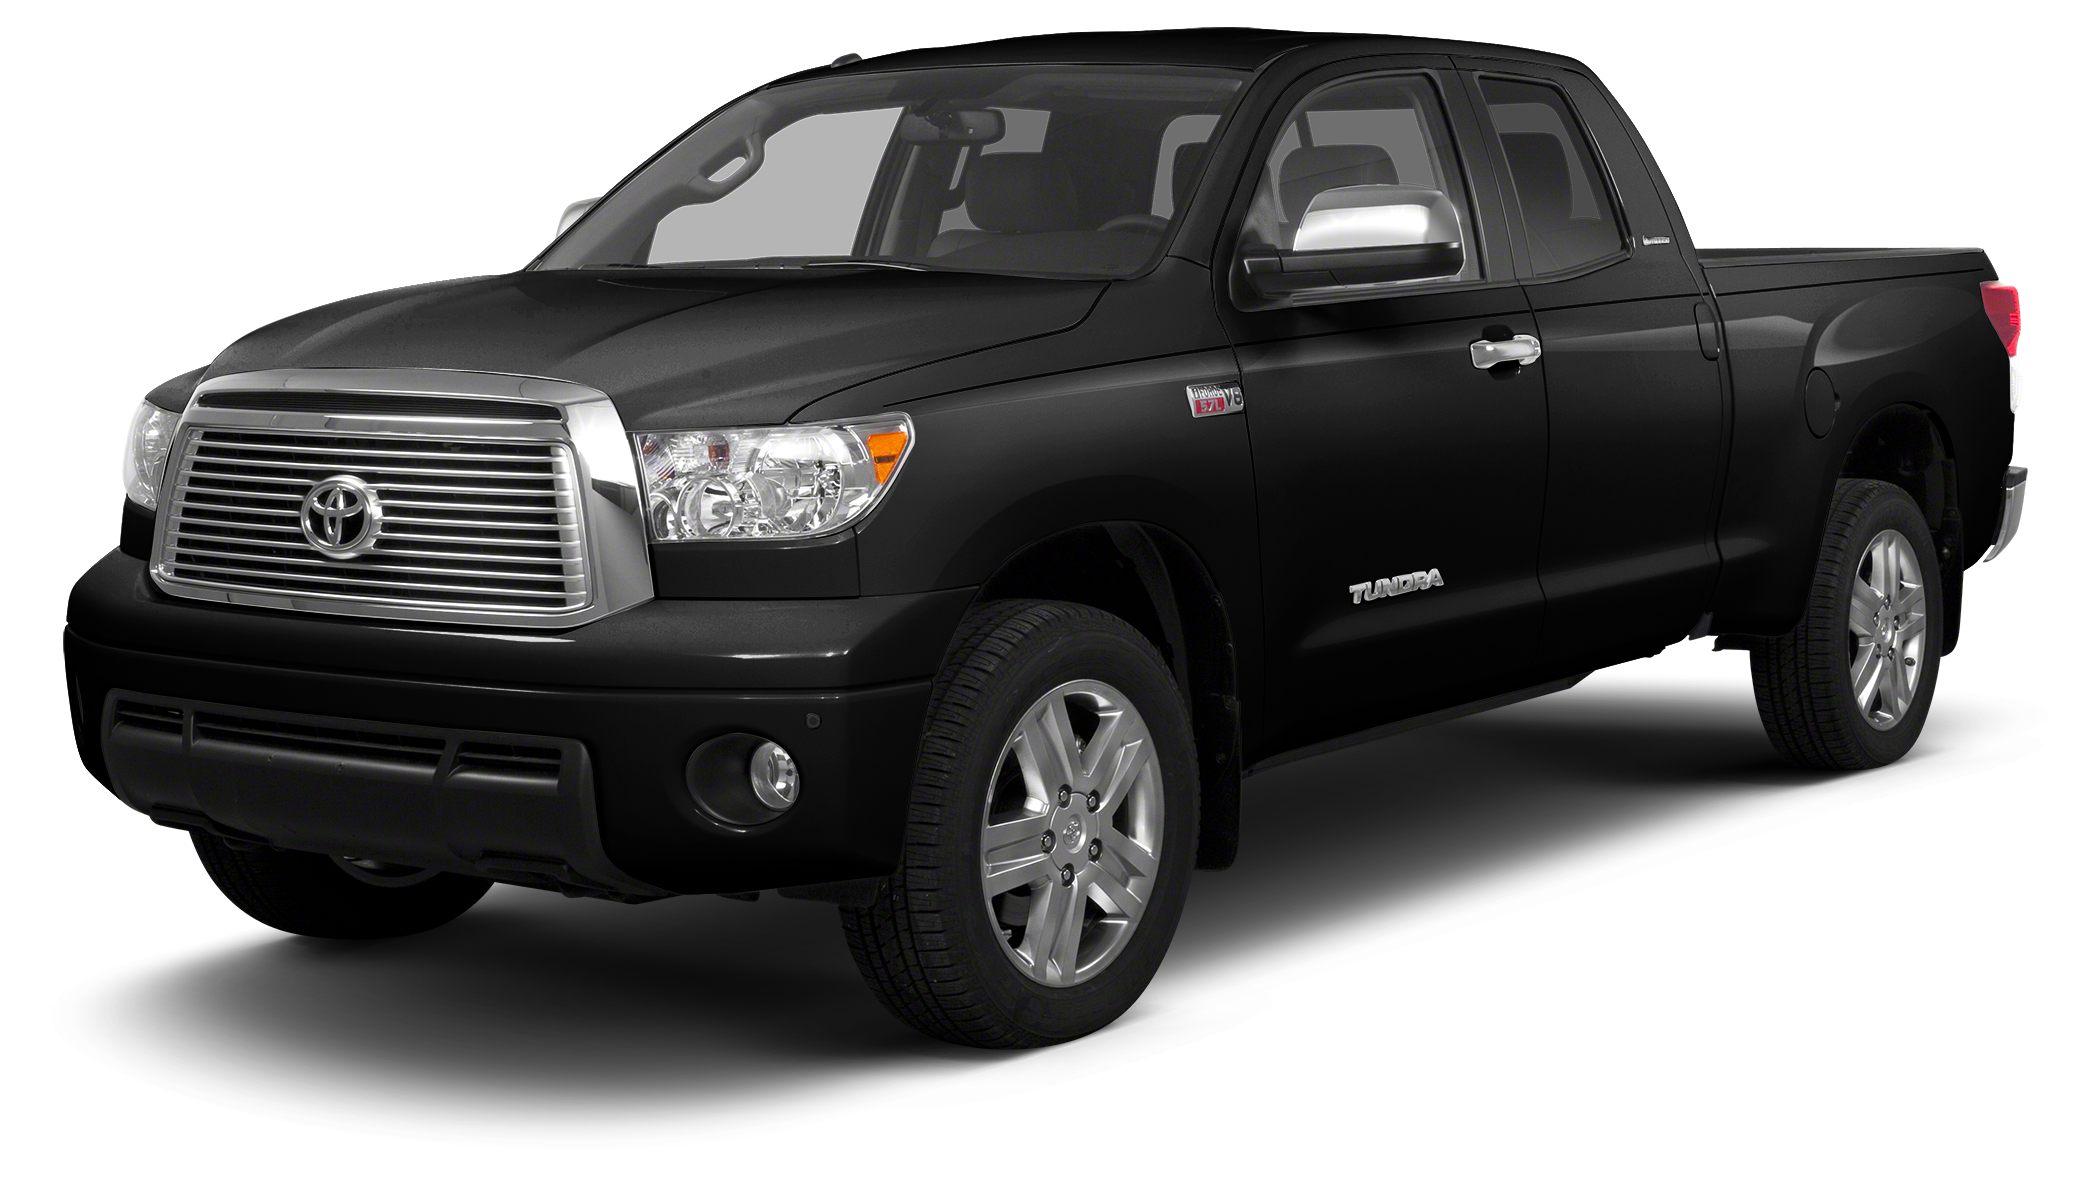 2013 Toyota Tundra Grade CARFAX 1-Owner GREAT MILES 32014 4600 below Kelley Blue Book Tundra